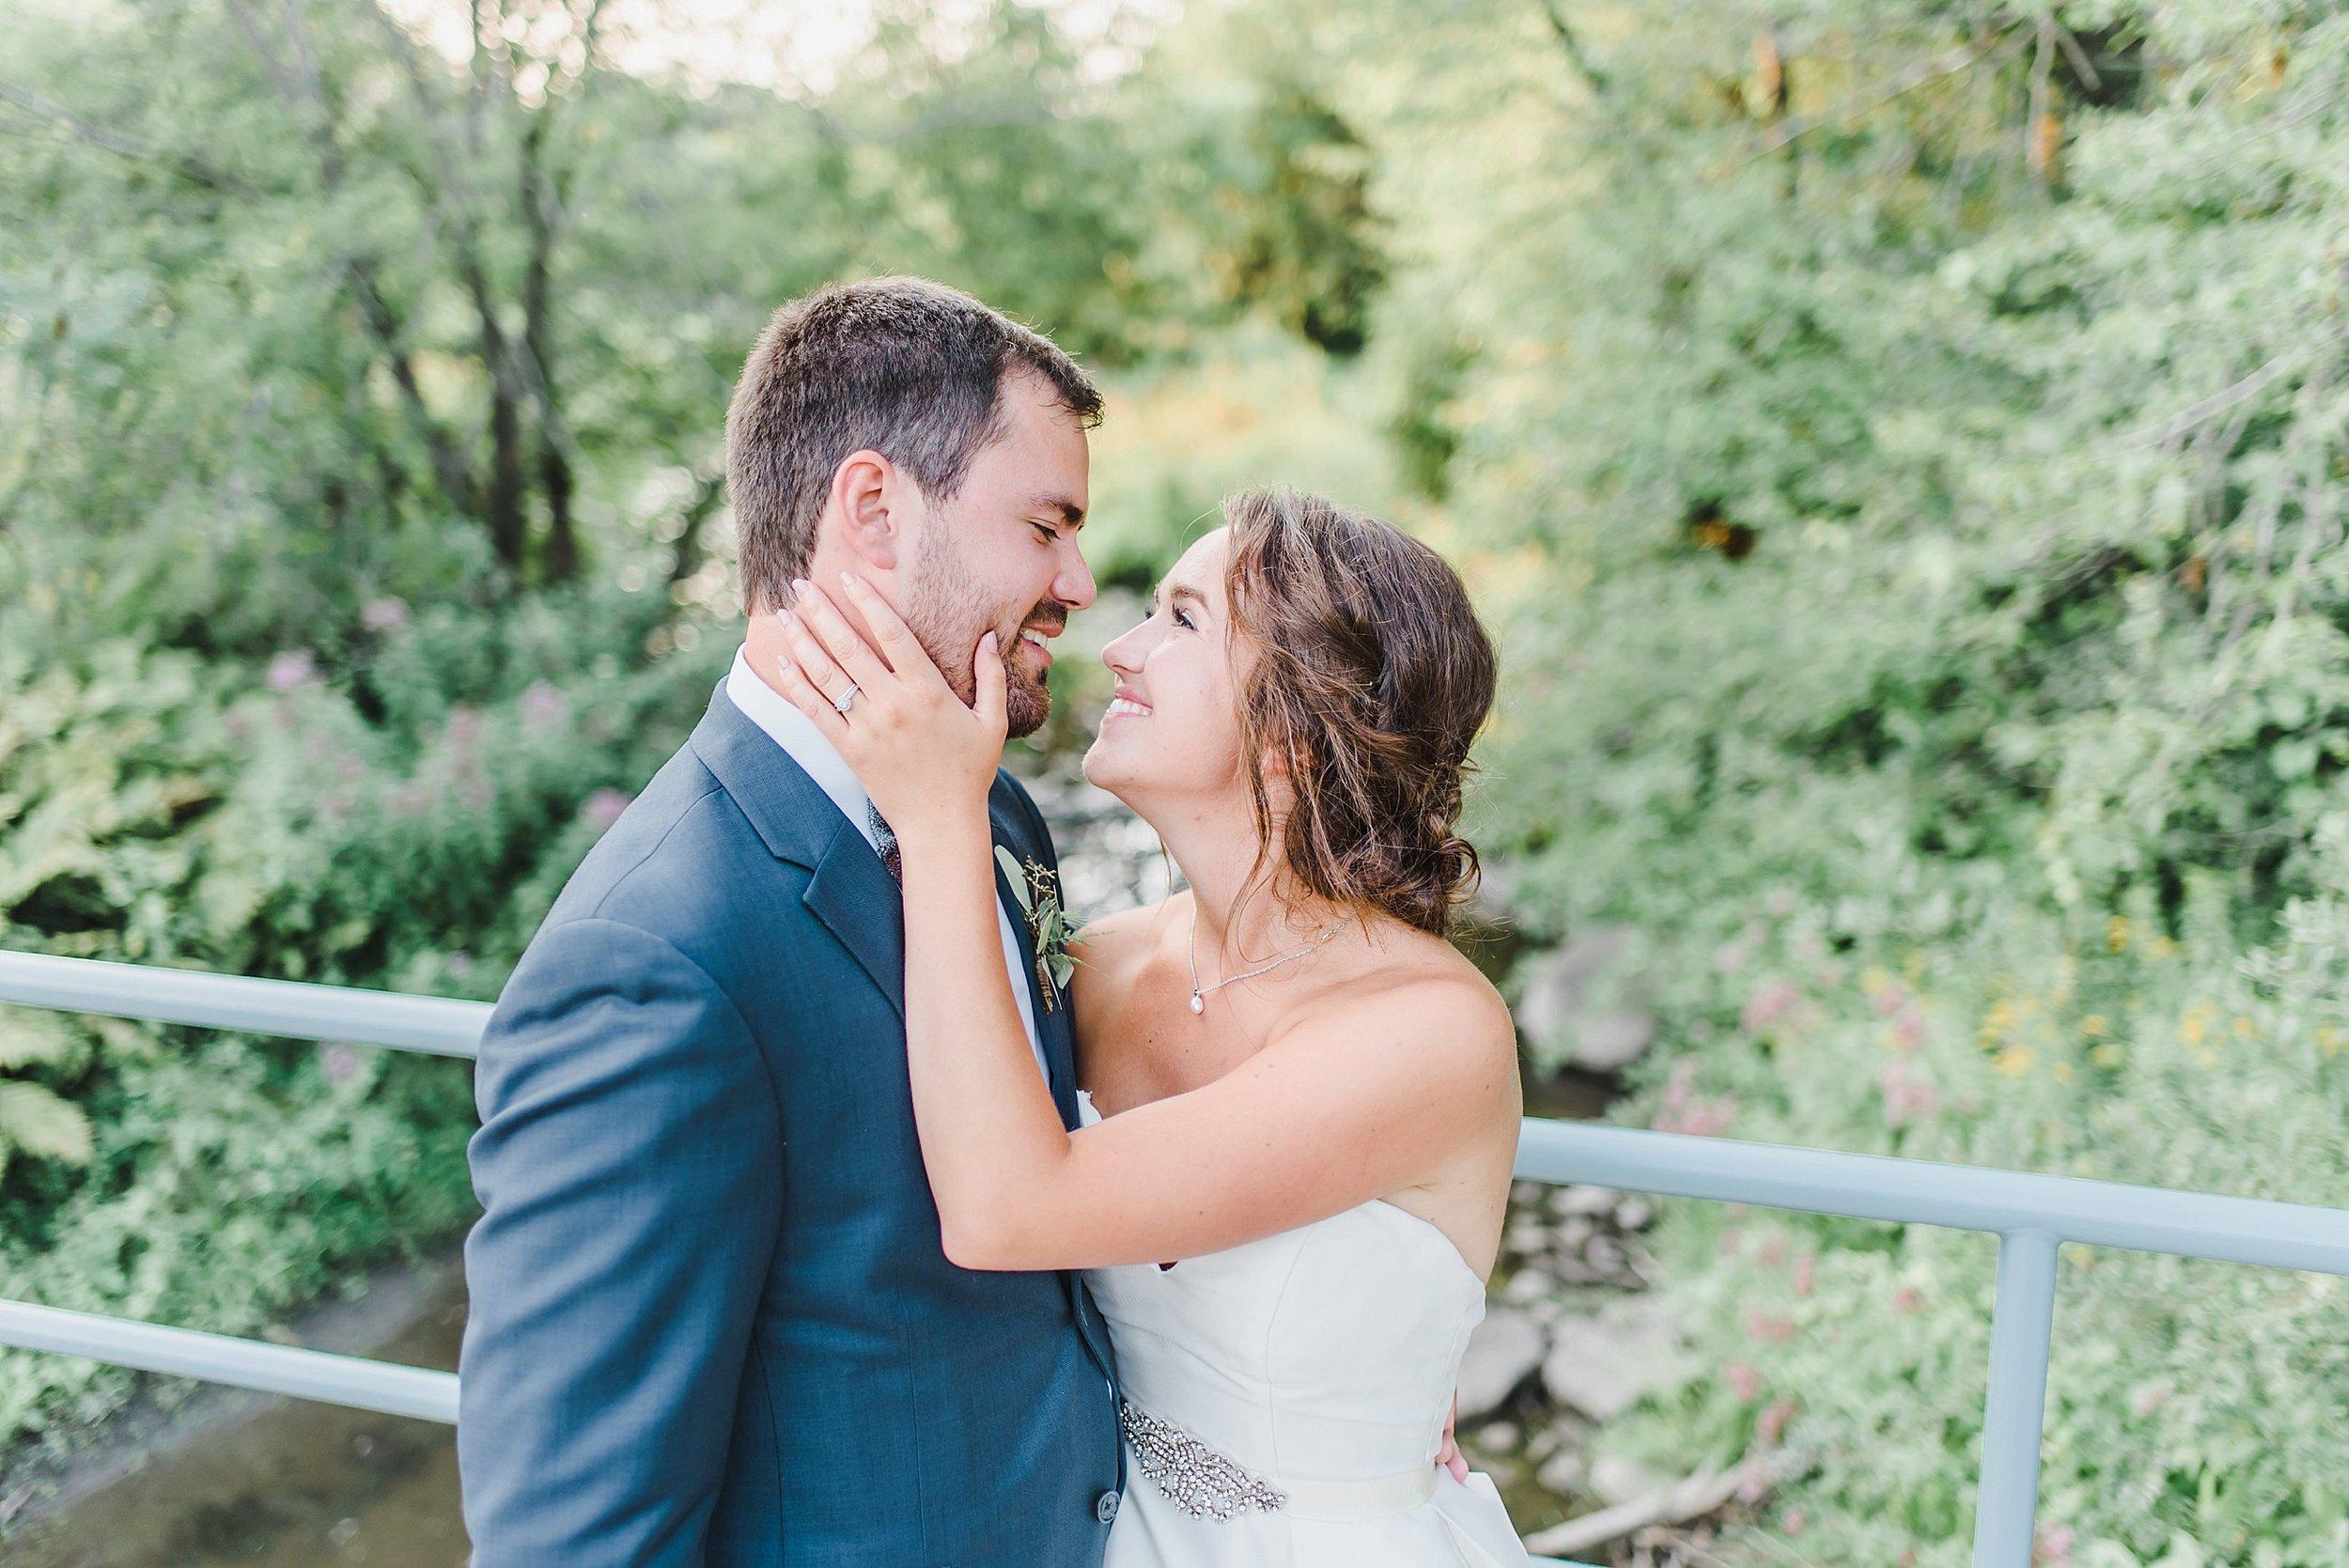 light airy indie fine art ottawa wedding photographer | Ali and Batoul Photography_0570.jpg